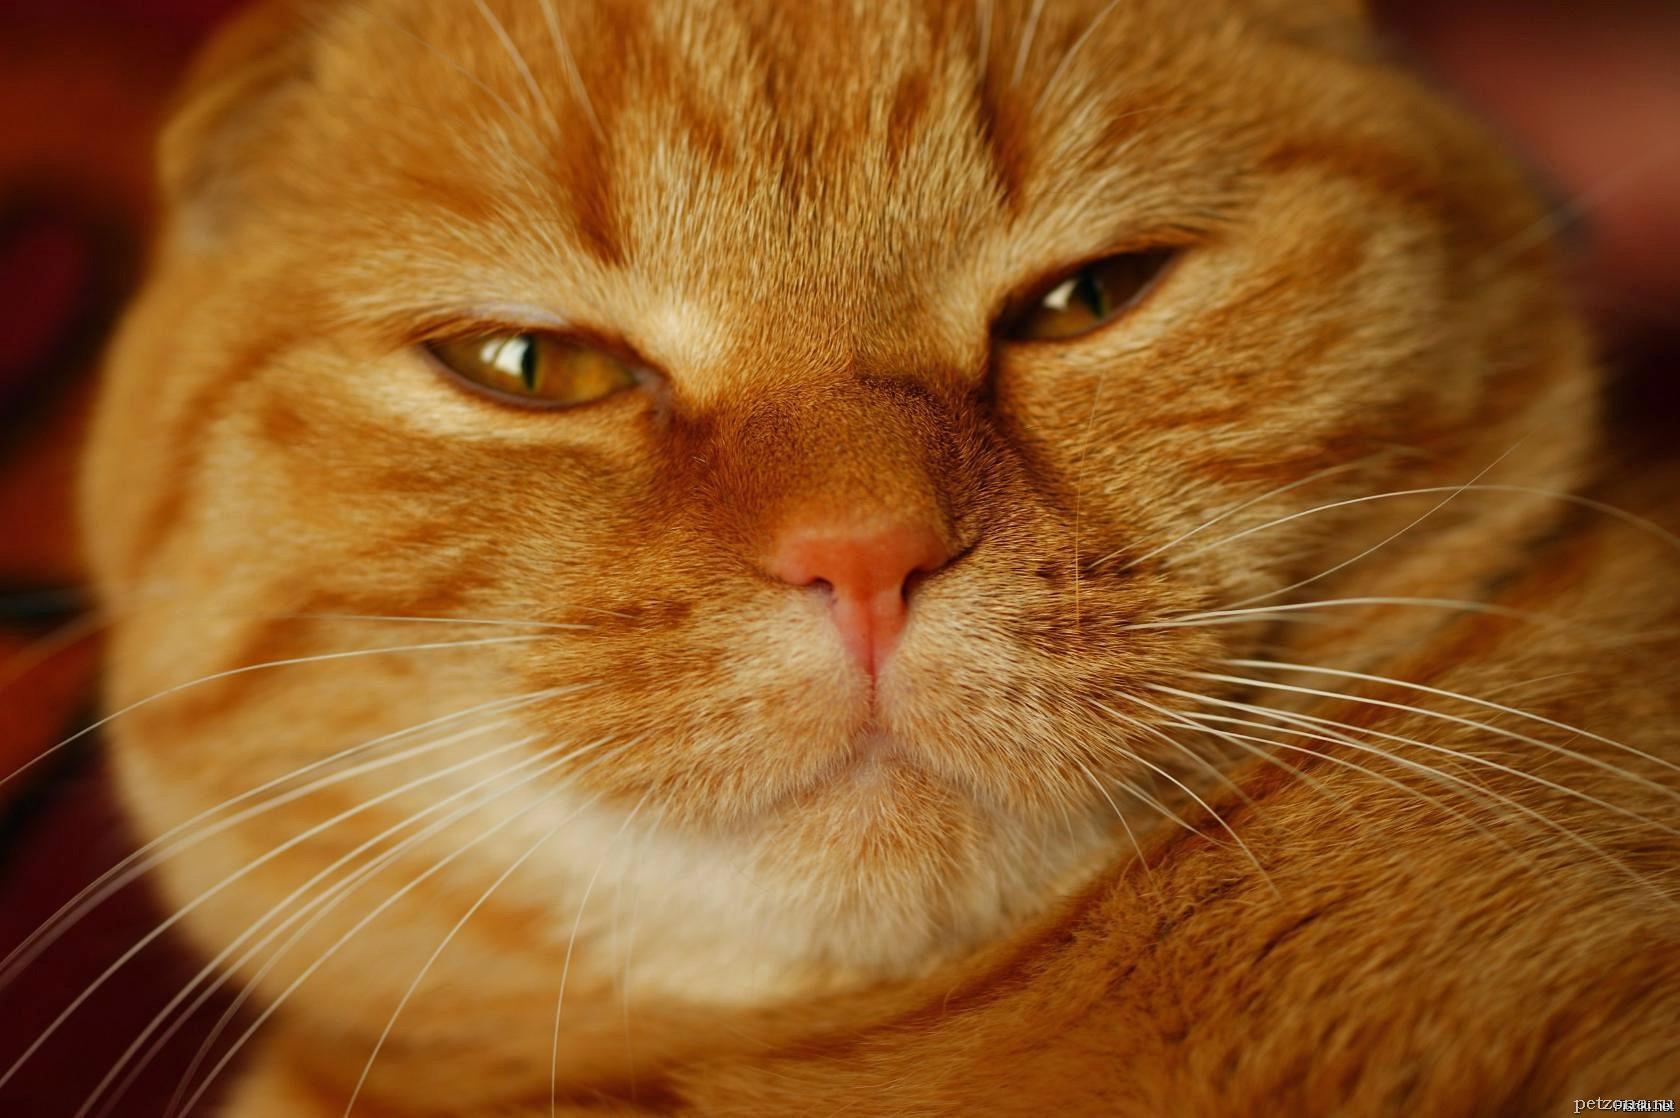 Дневник кота Плинтуса. Часть 3 (3.1)